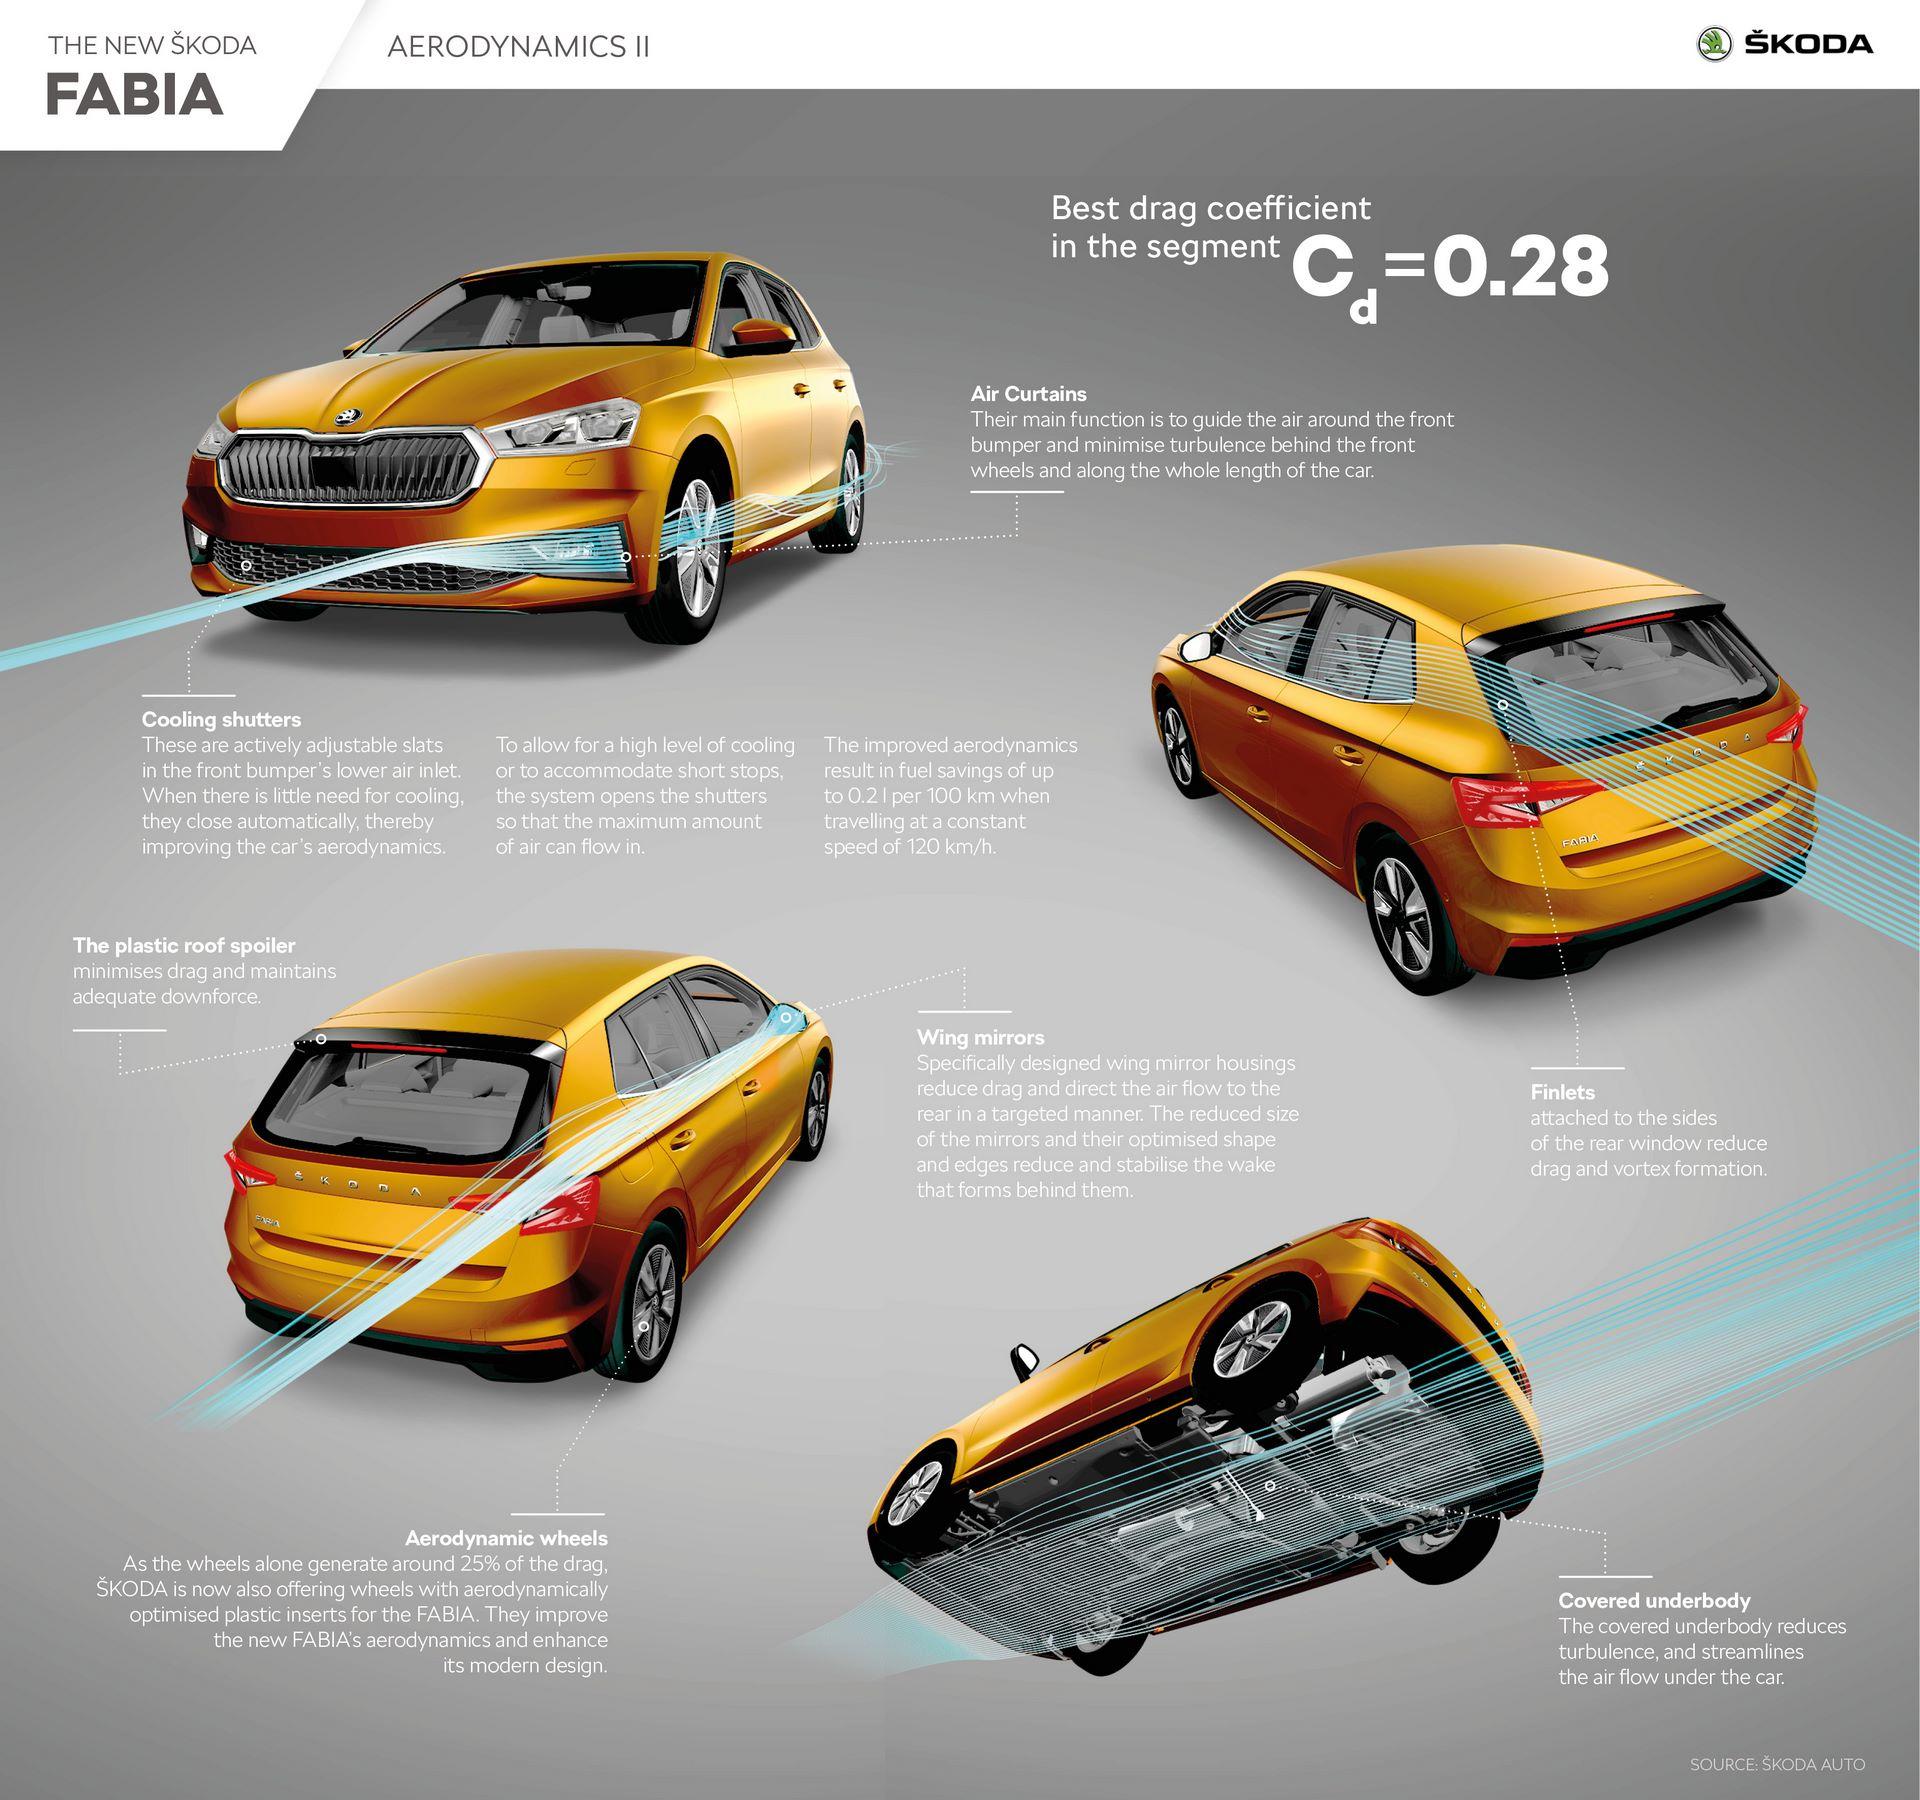 SKODA_FABIA_Aerodynamics_II